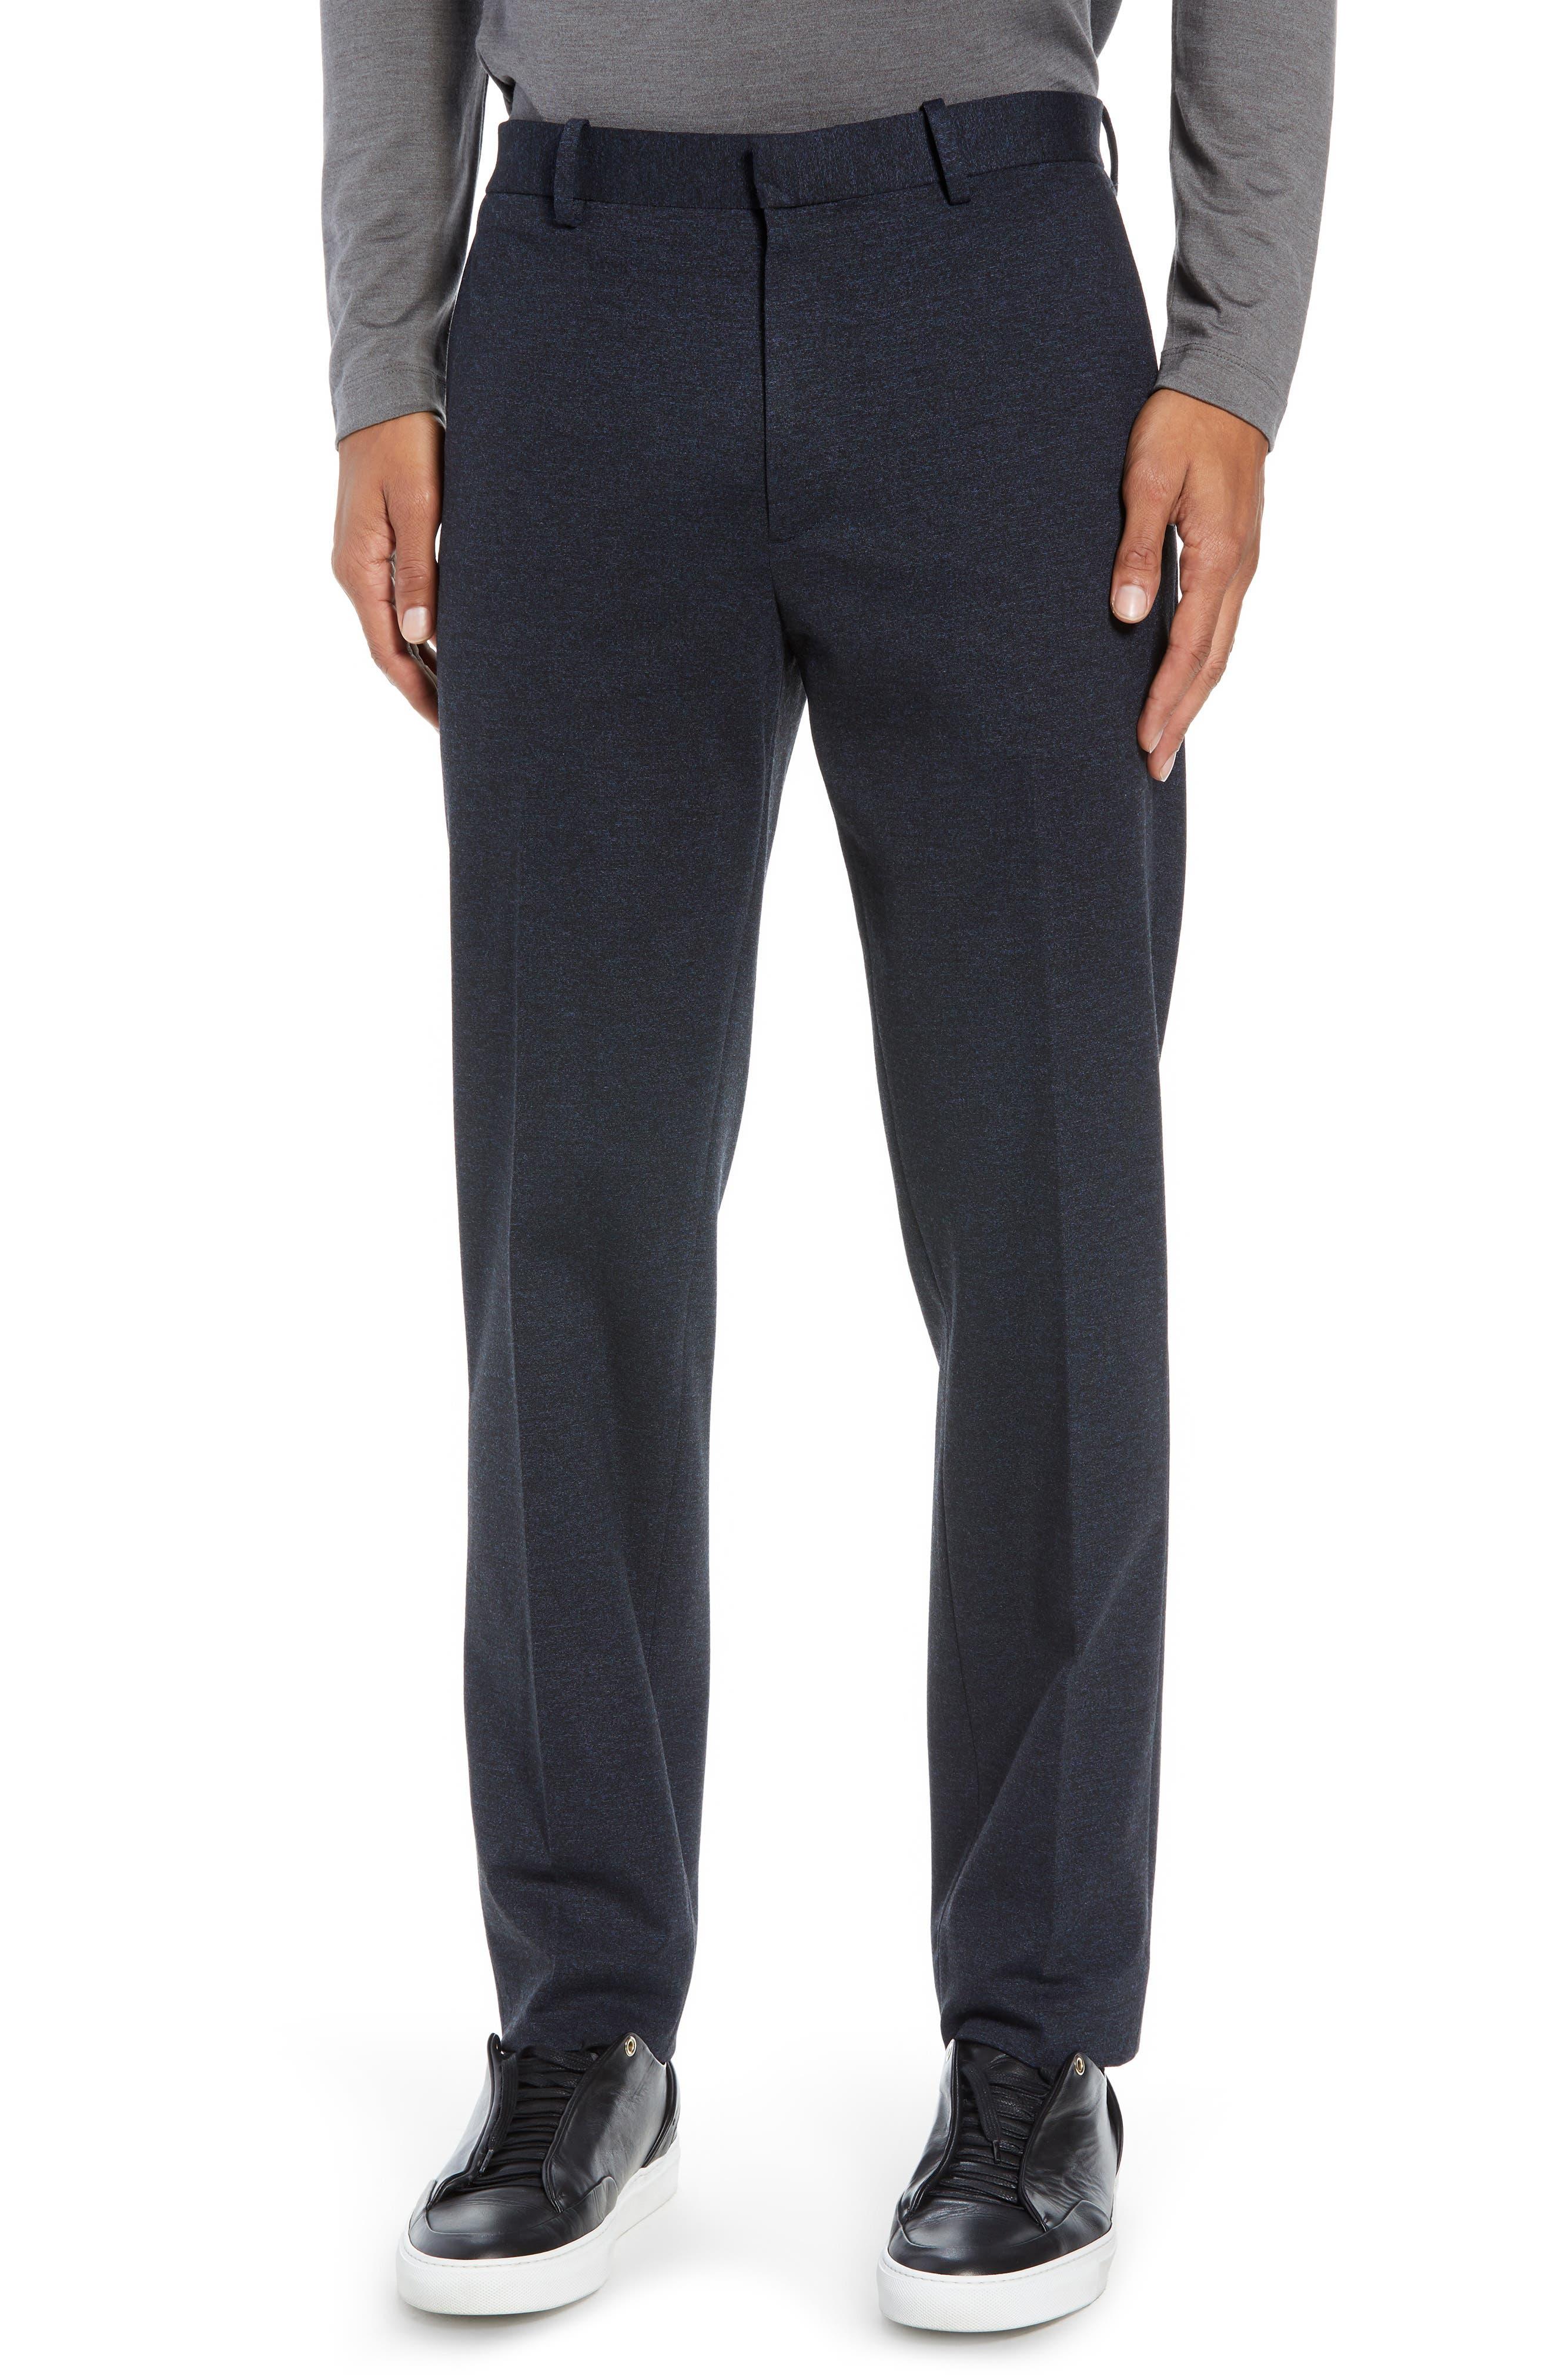 Payton Marled Ponte Trousers,                         Main,                         color, ECLIPSE MELANGE